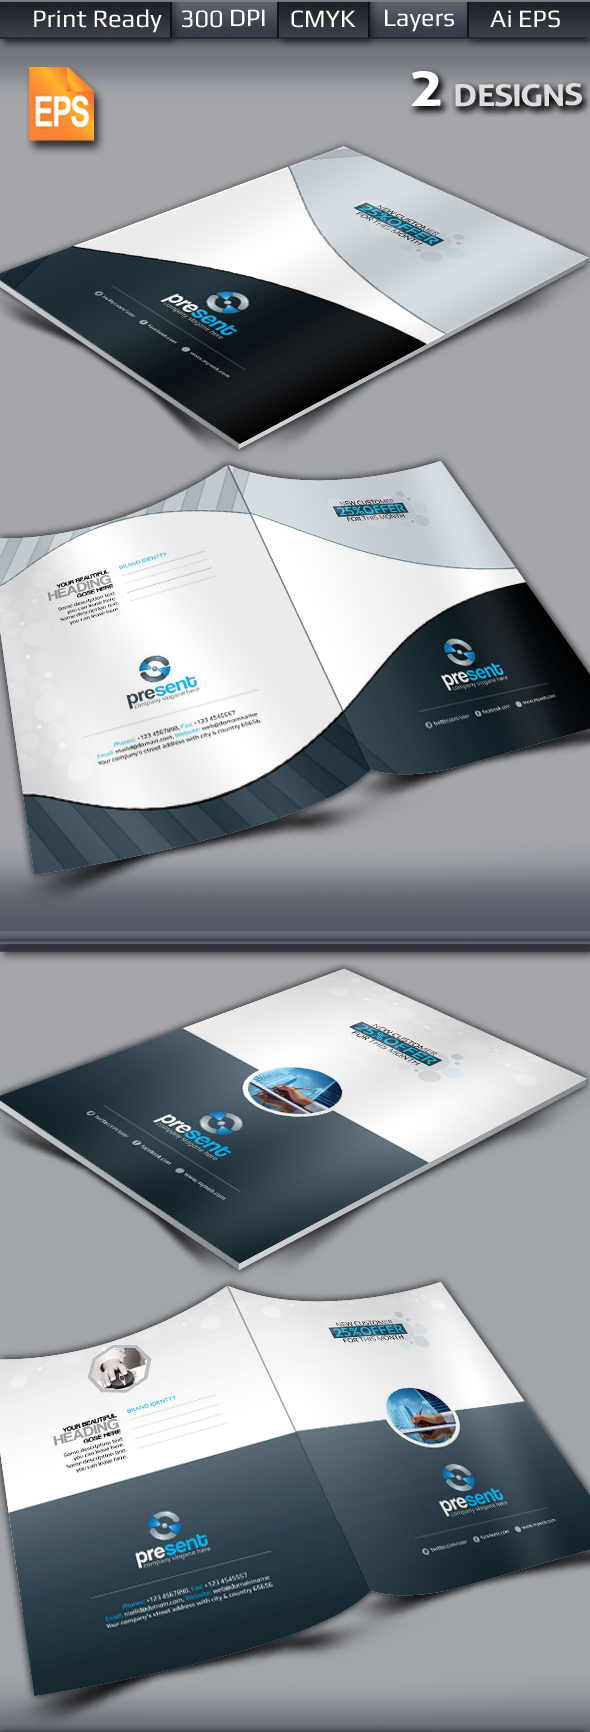 Present Corporate Presentation Folder Template